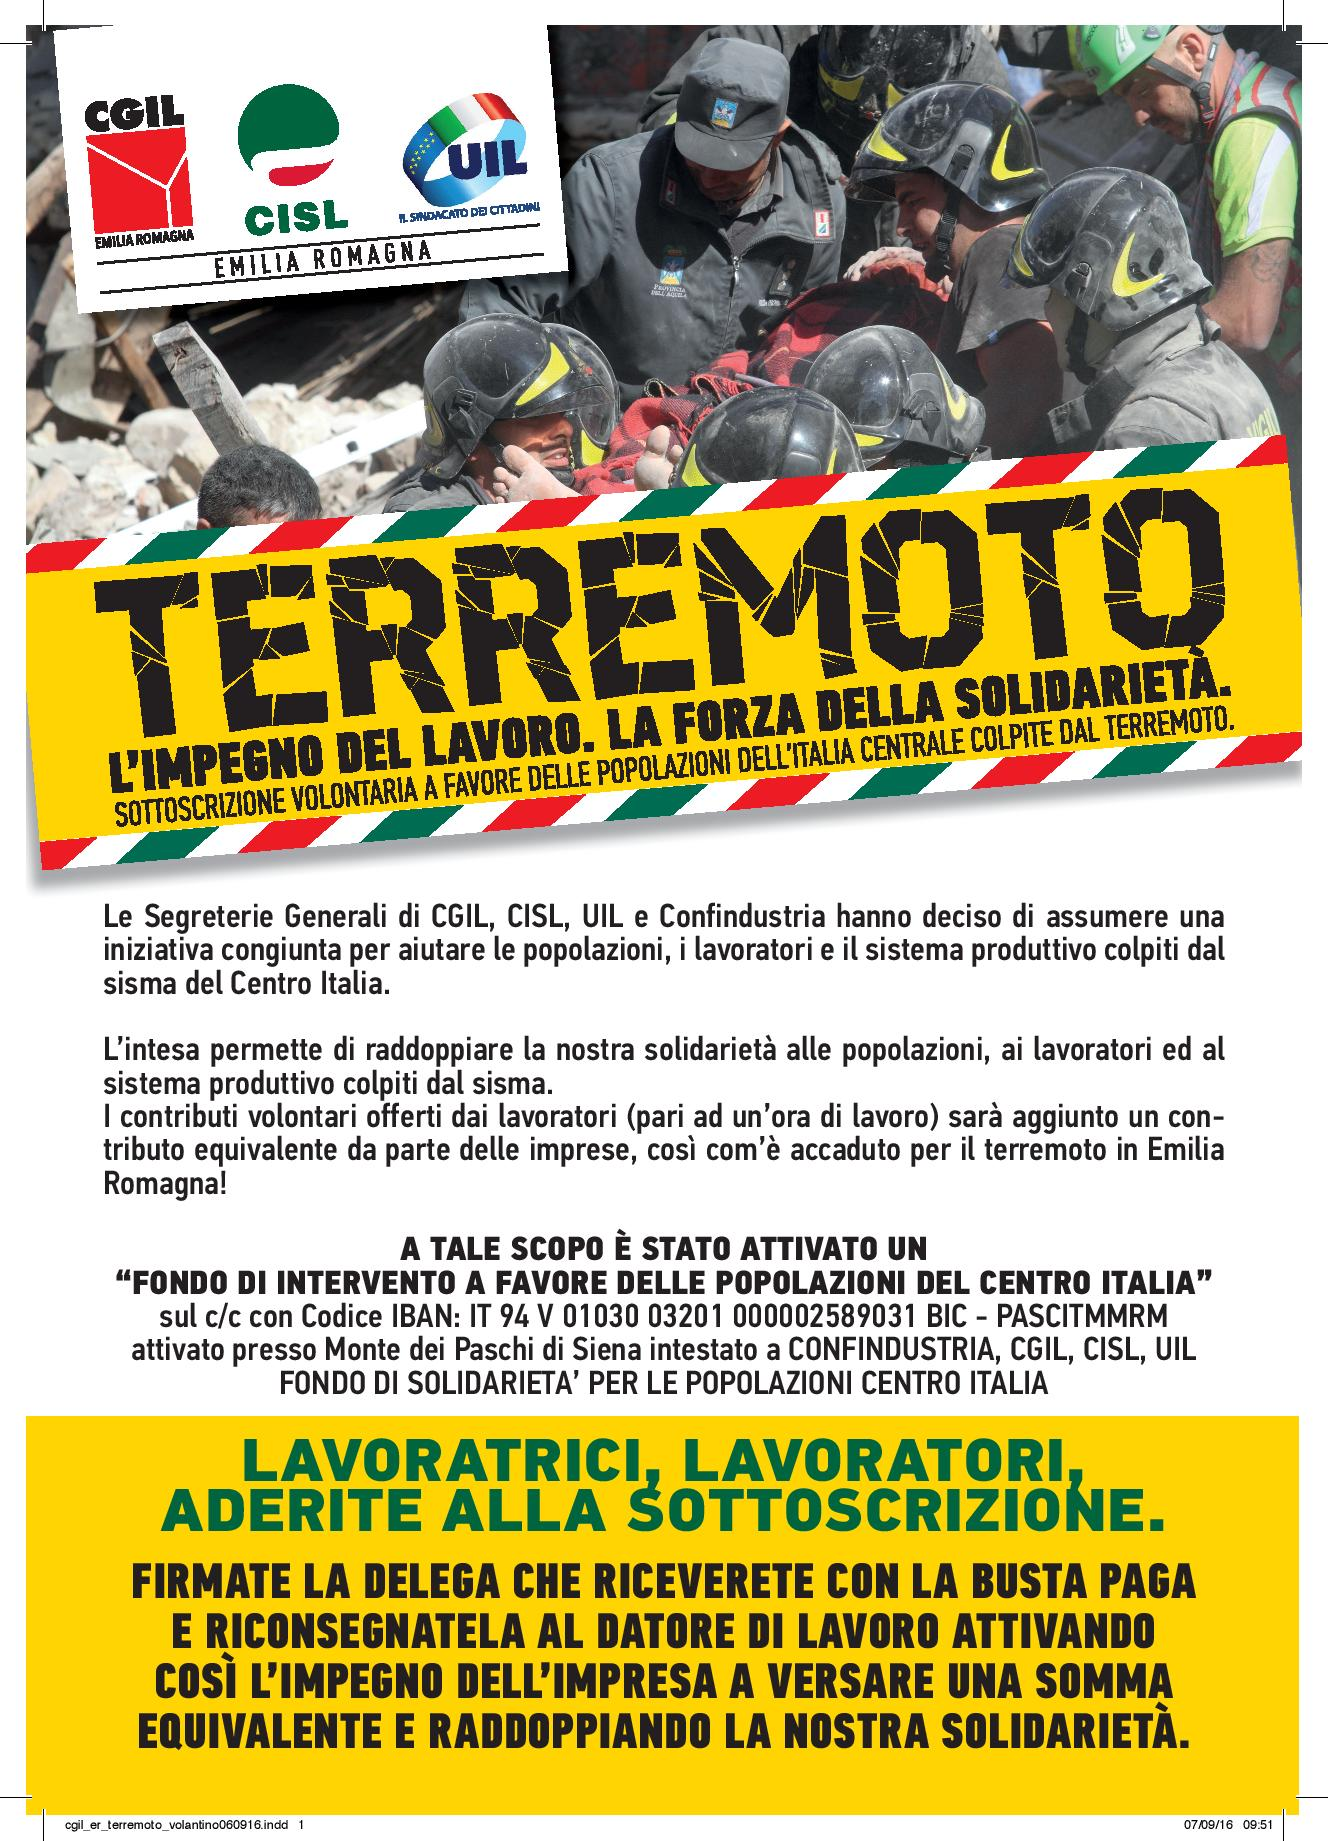 cgil_er_terremoto_volantino060916_print-page-001